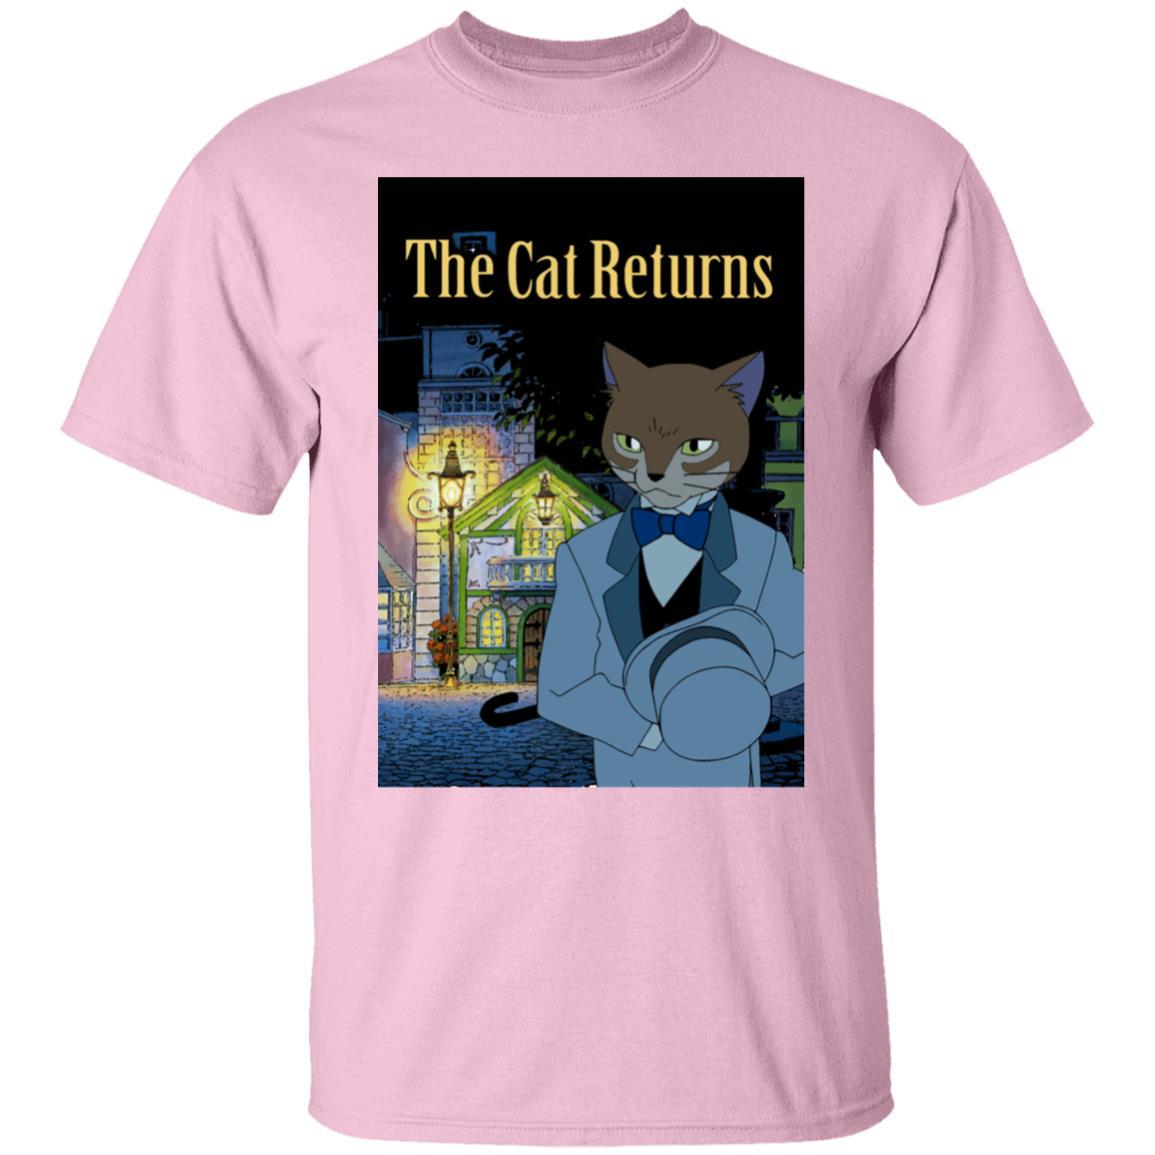 The Cat Returns Poster T Shirt Unisex